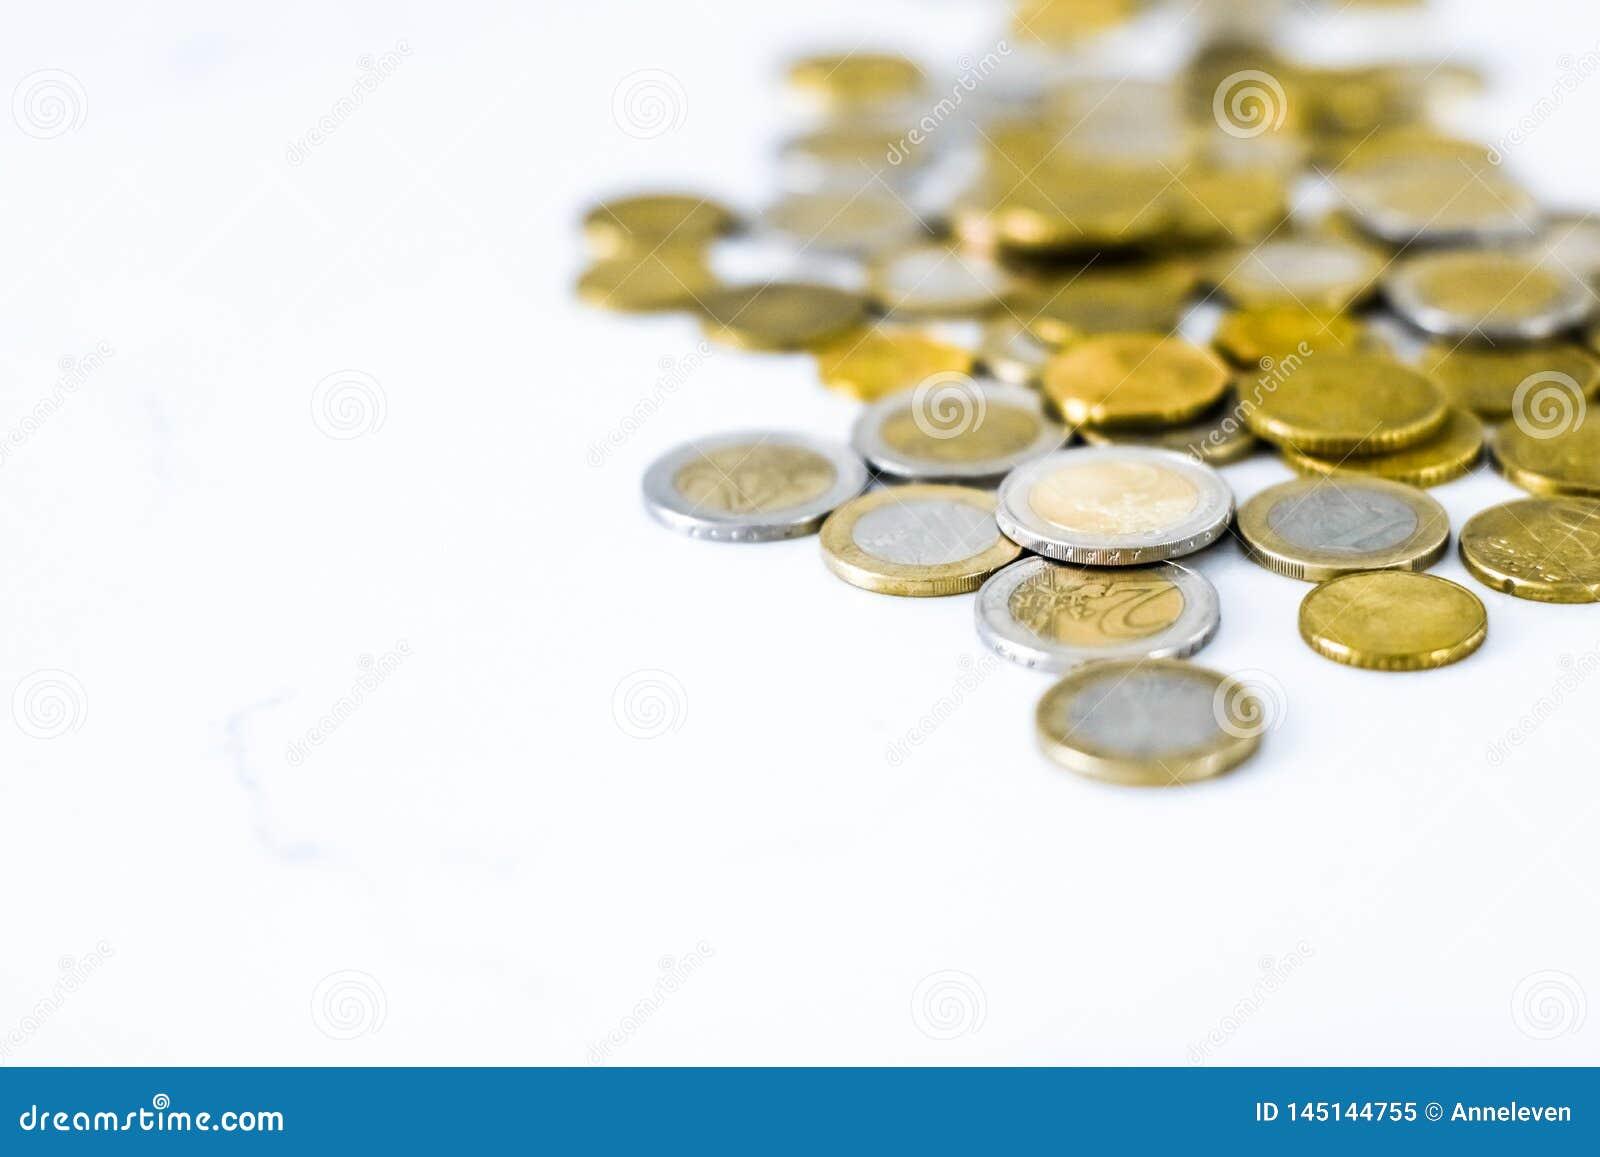 Euro coins, European Union currency